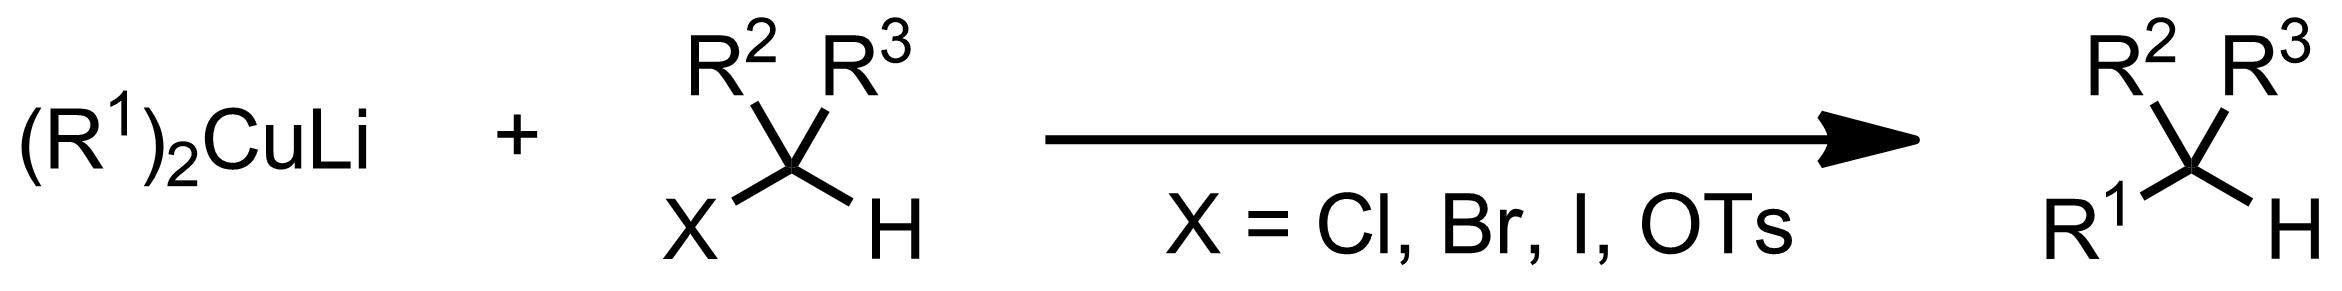 Schematic representation of the Corey-Posner, Whitesides-House Reaction.